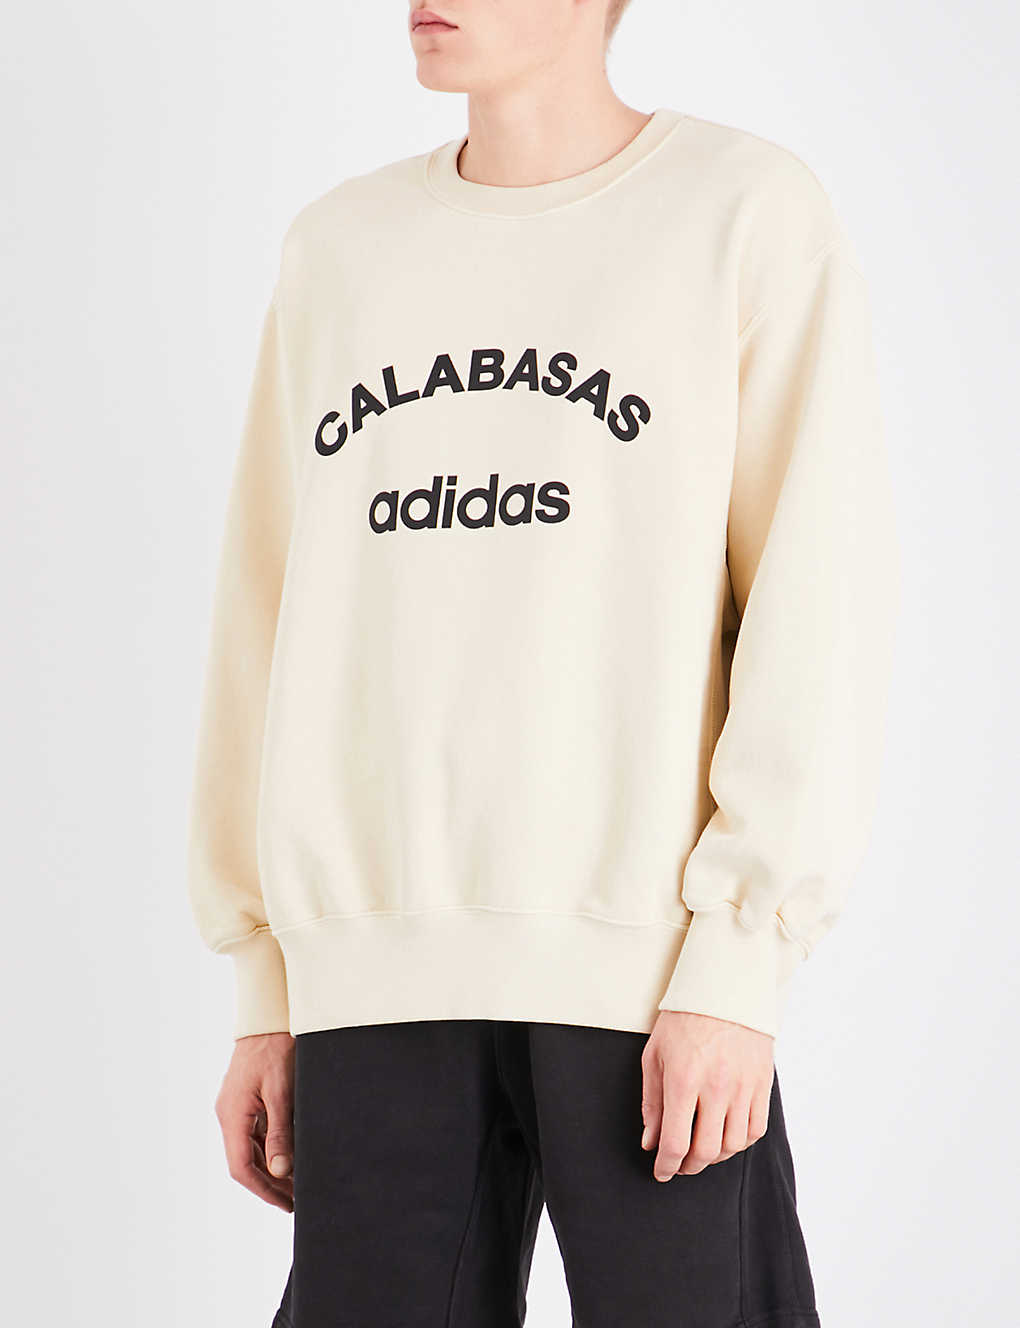 57163a663 YEEZY - Season 5 Calabasas adidas cotton-jersey sweatshirt ...